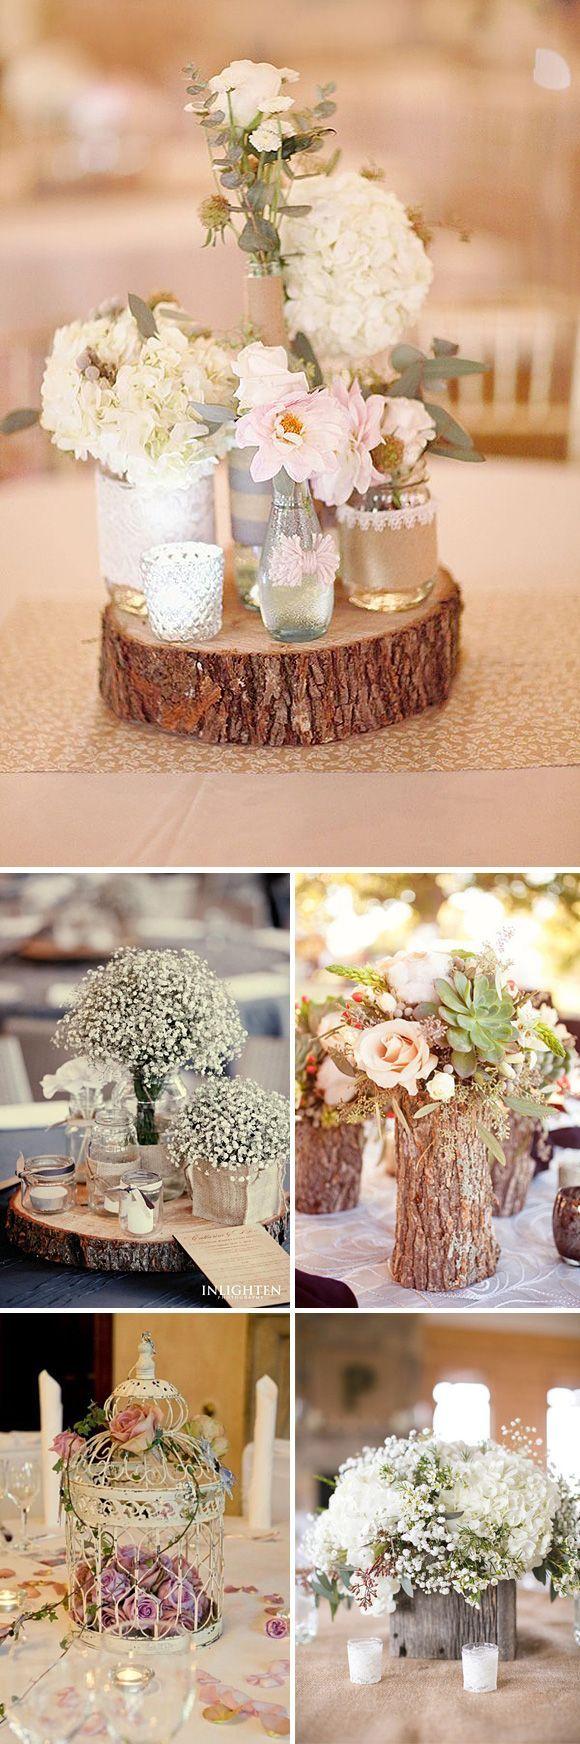 Centros de mesa para bodas rusticas rustic wedding for Mesas de centro rusticas baratas